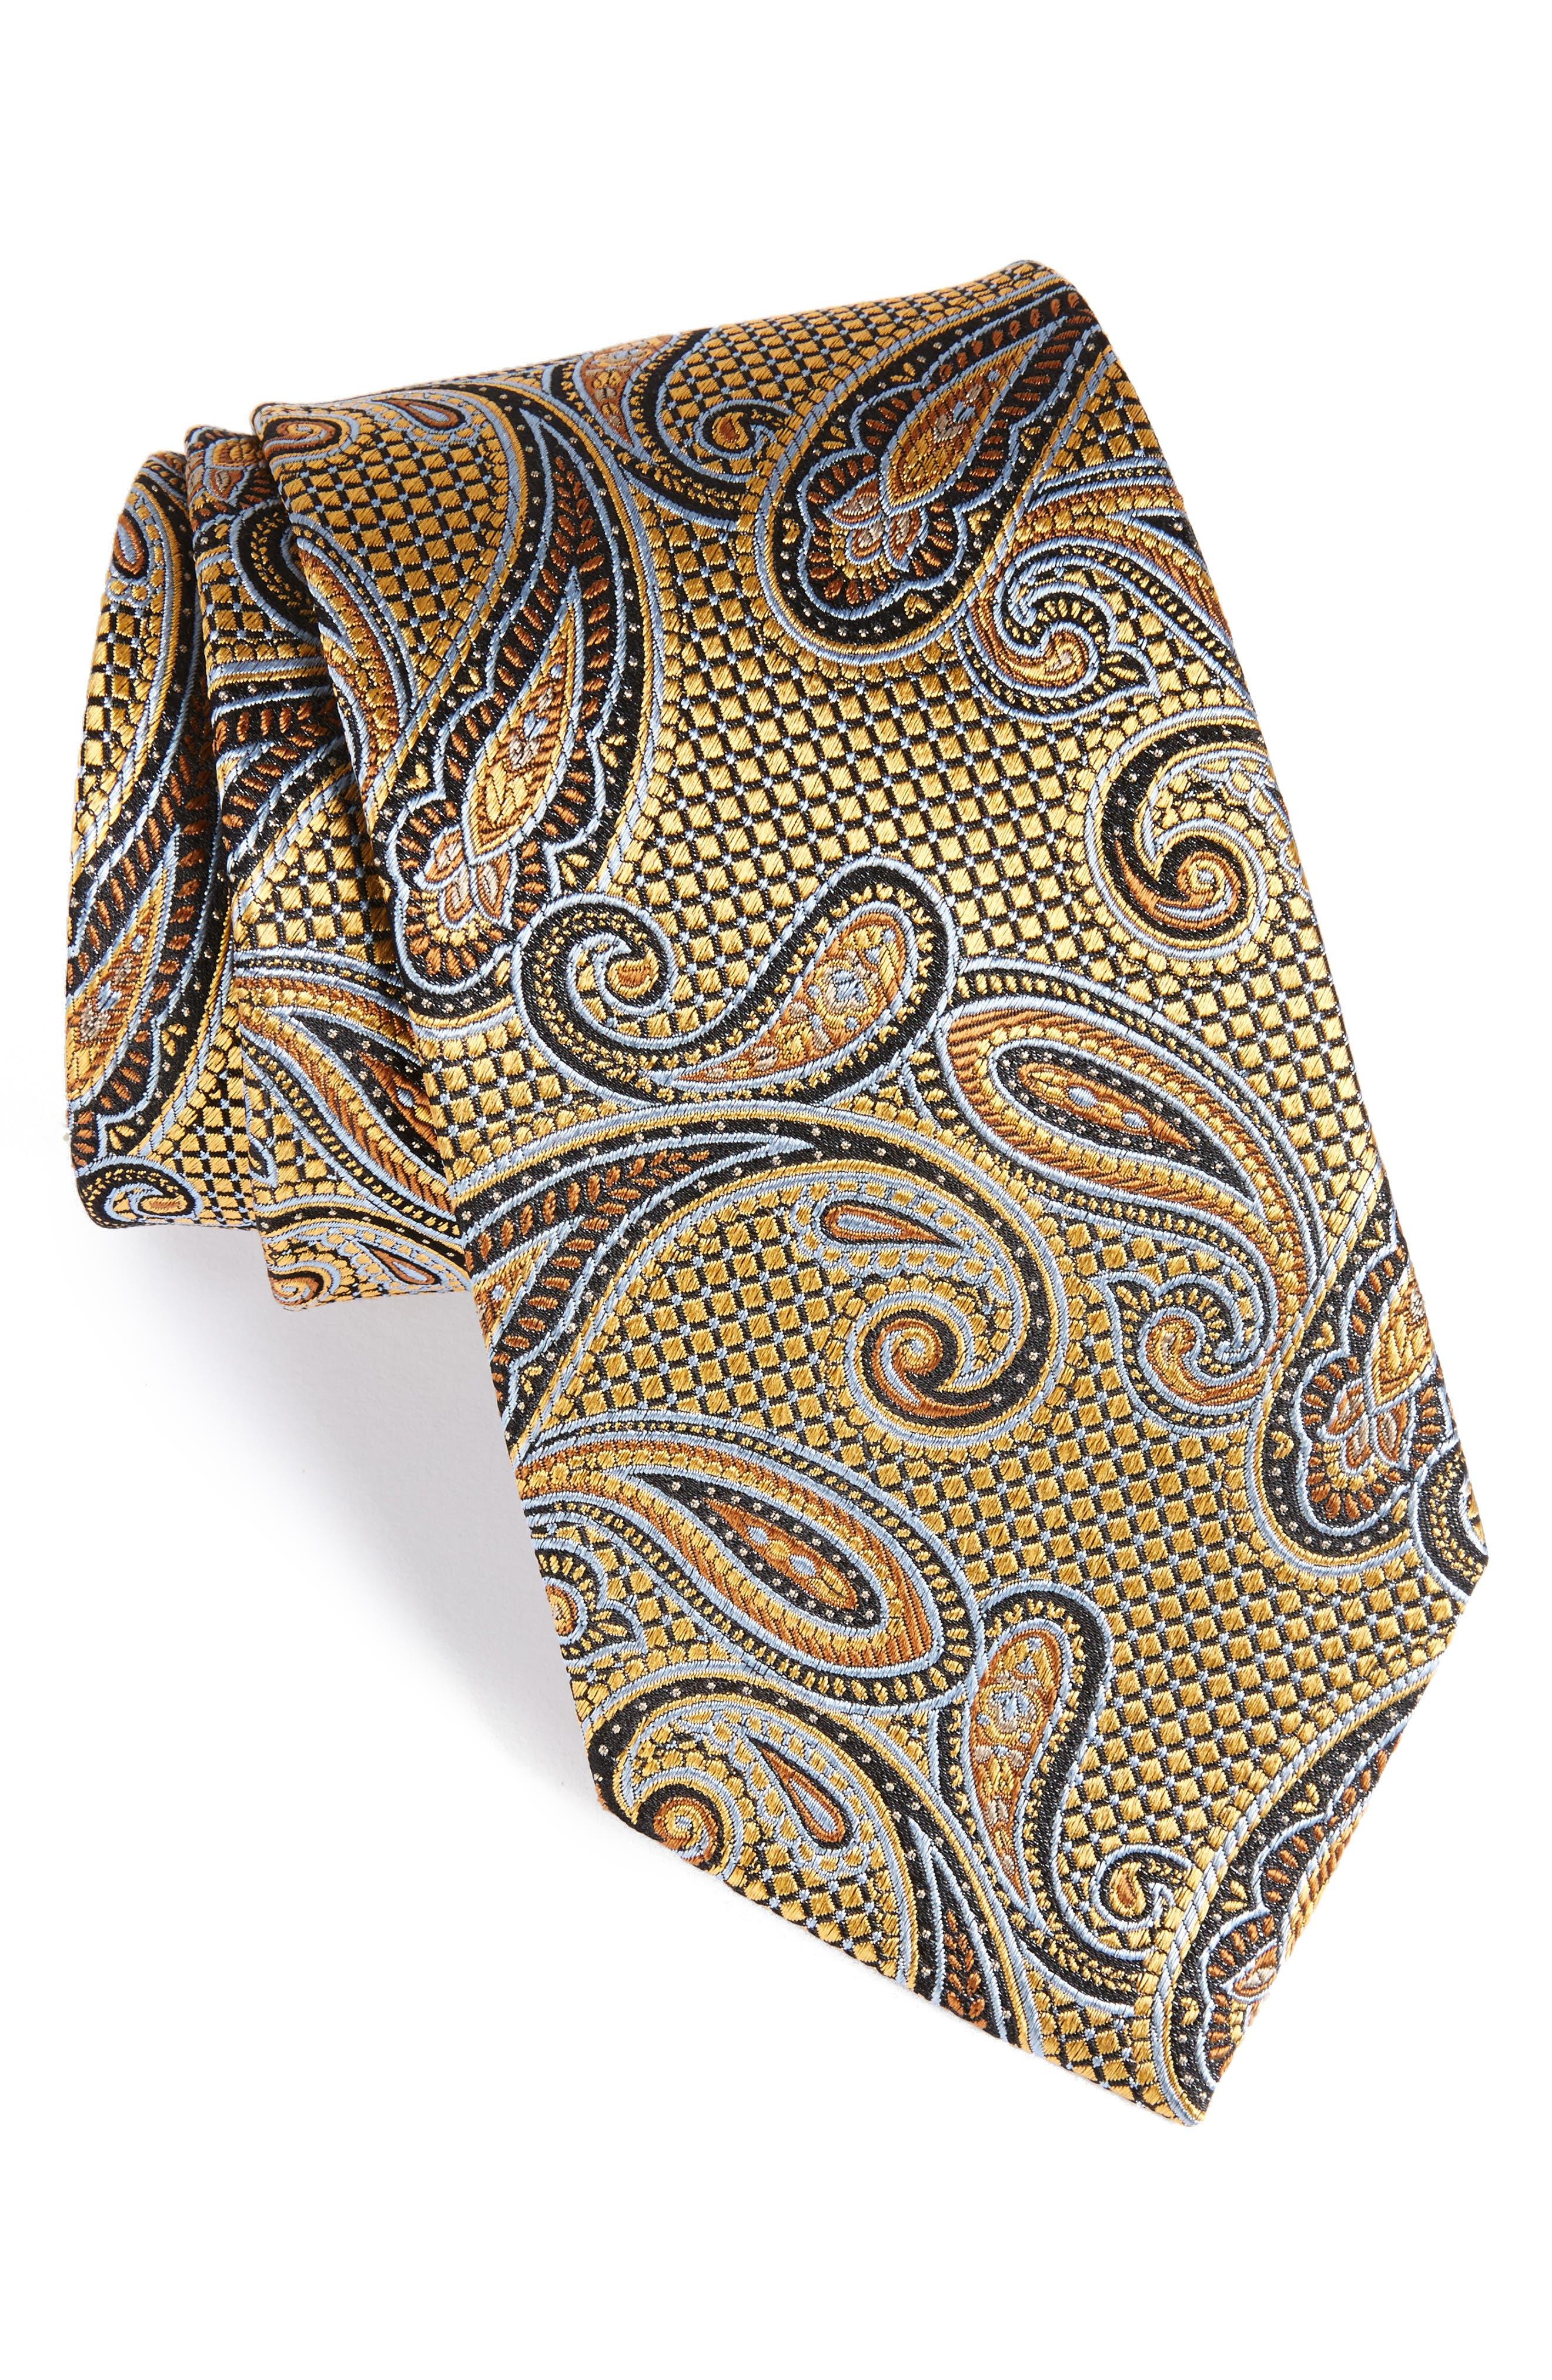 Alternate Image 1 Selected - Nordstrom Men's Shop Paisley Silk Tie (X-Long)